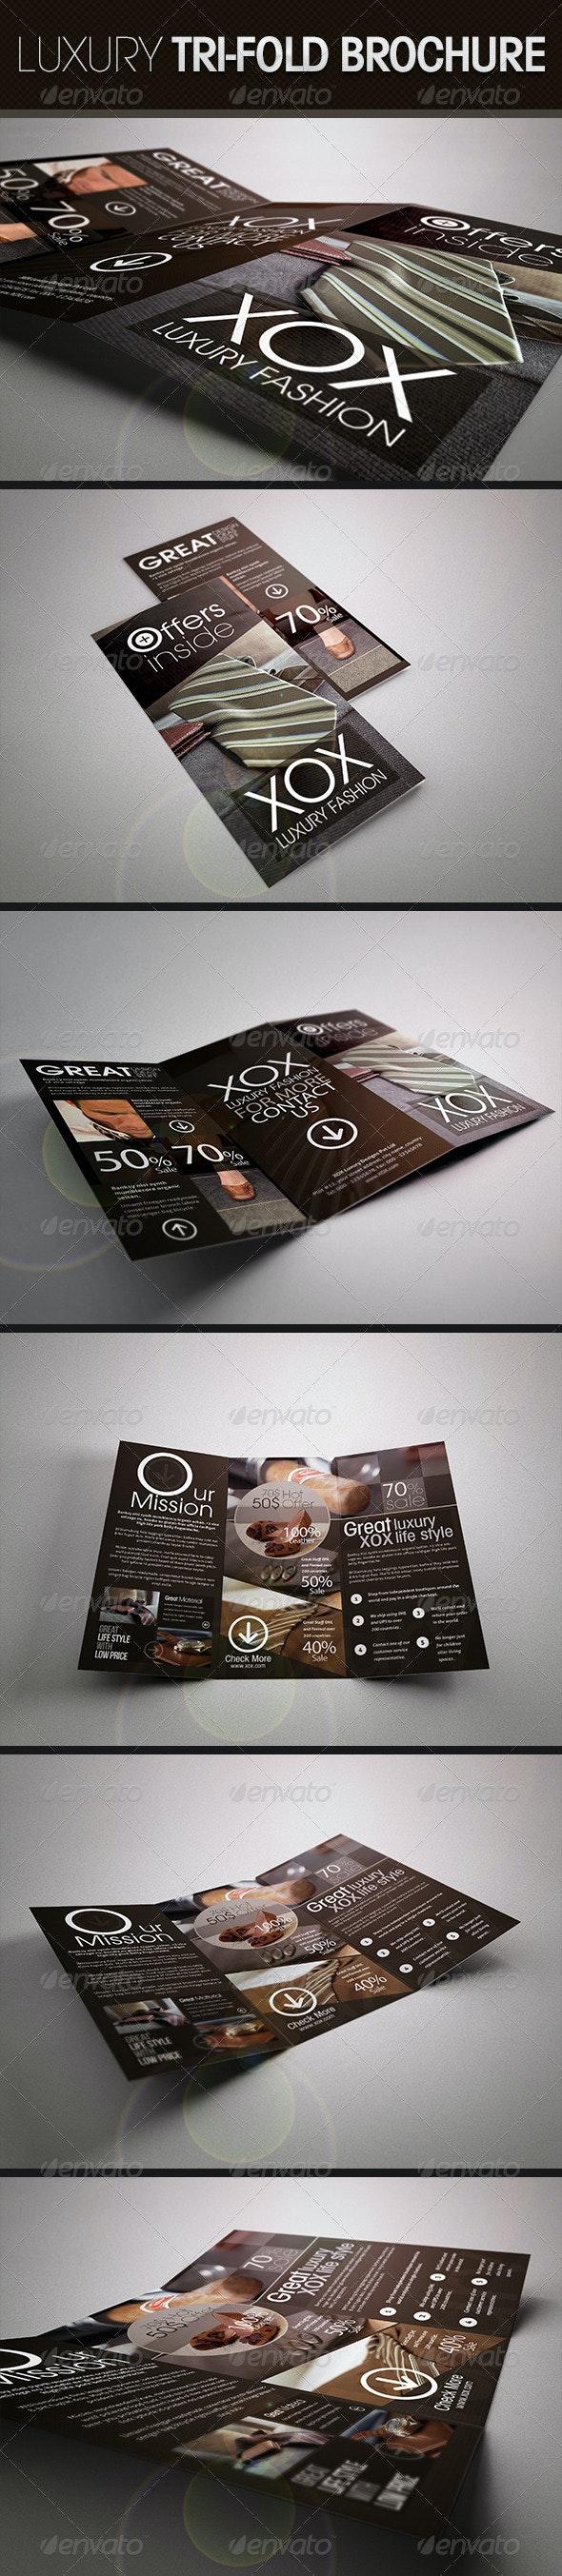 Luxury Trifold Brochure - Corporate Brochures